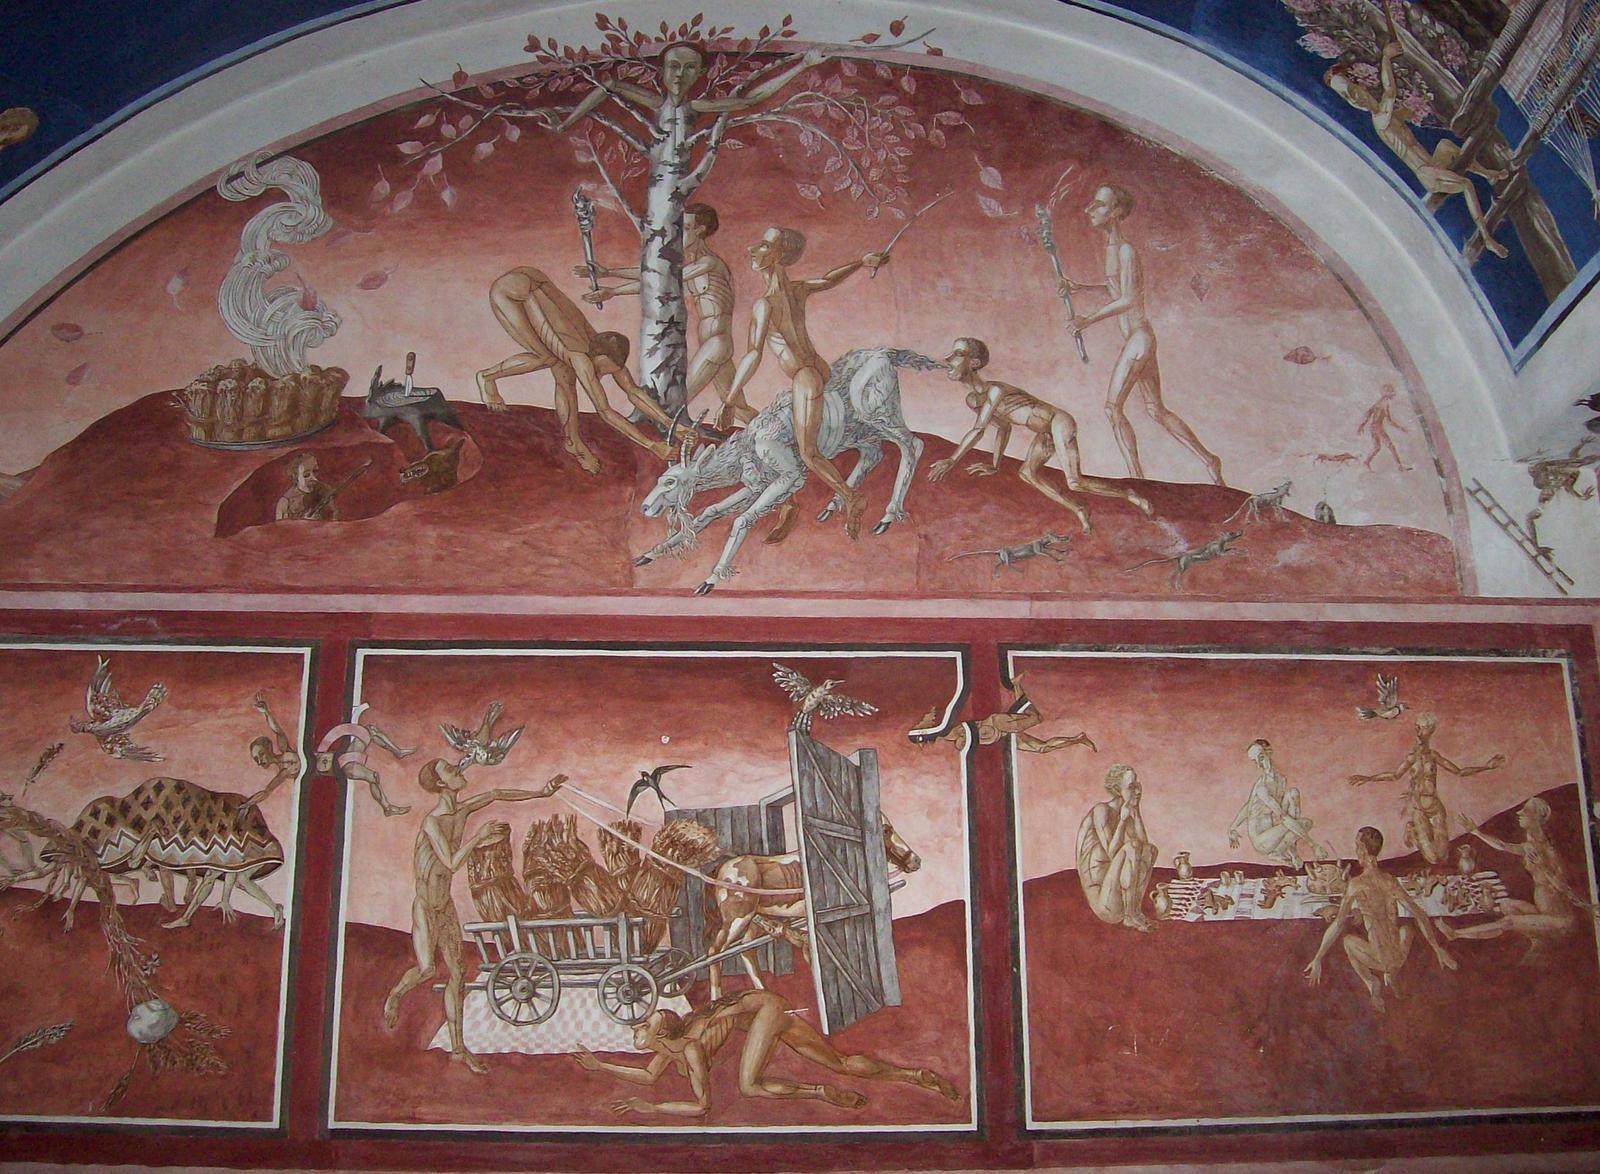 Fresken, geschaffen von Petras Repšys zum 400 jährigen Jubiläum der Universität Vilnius